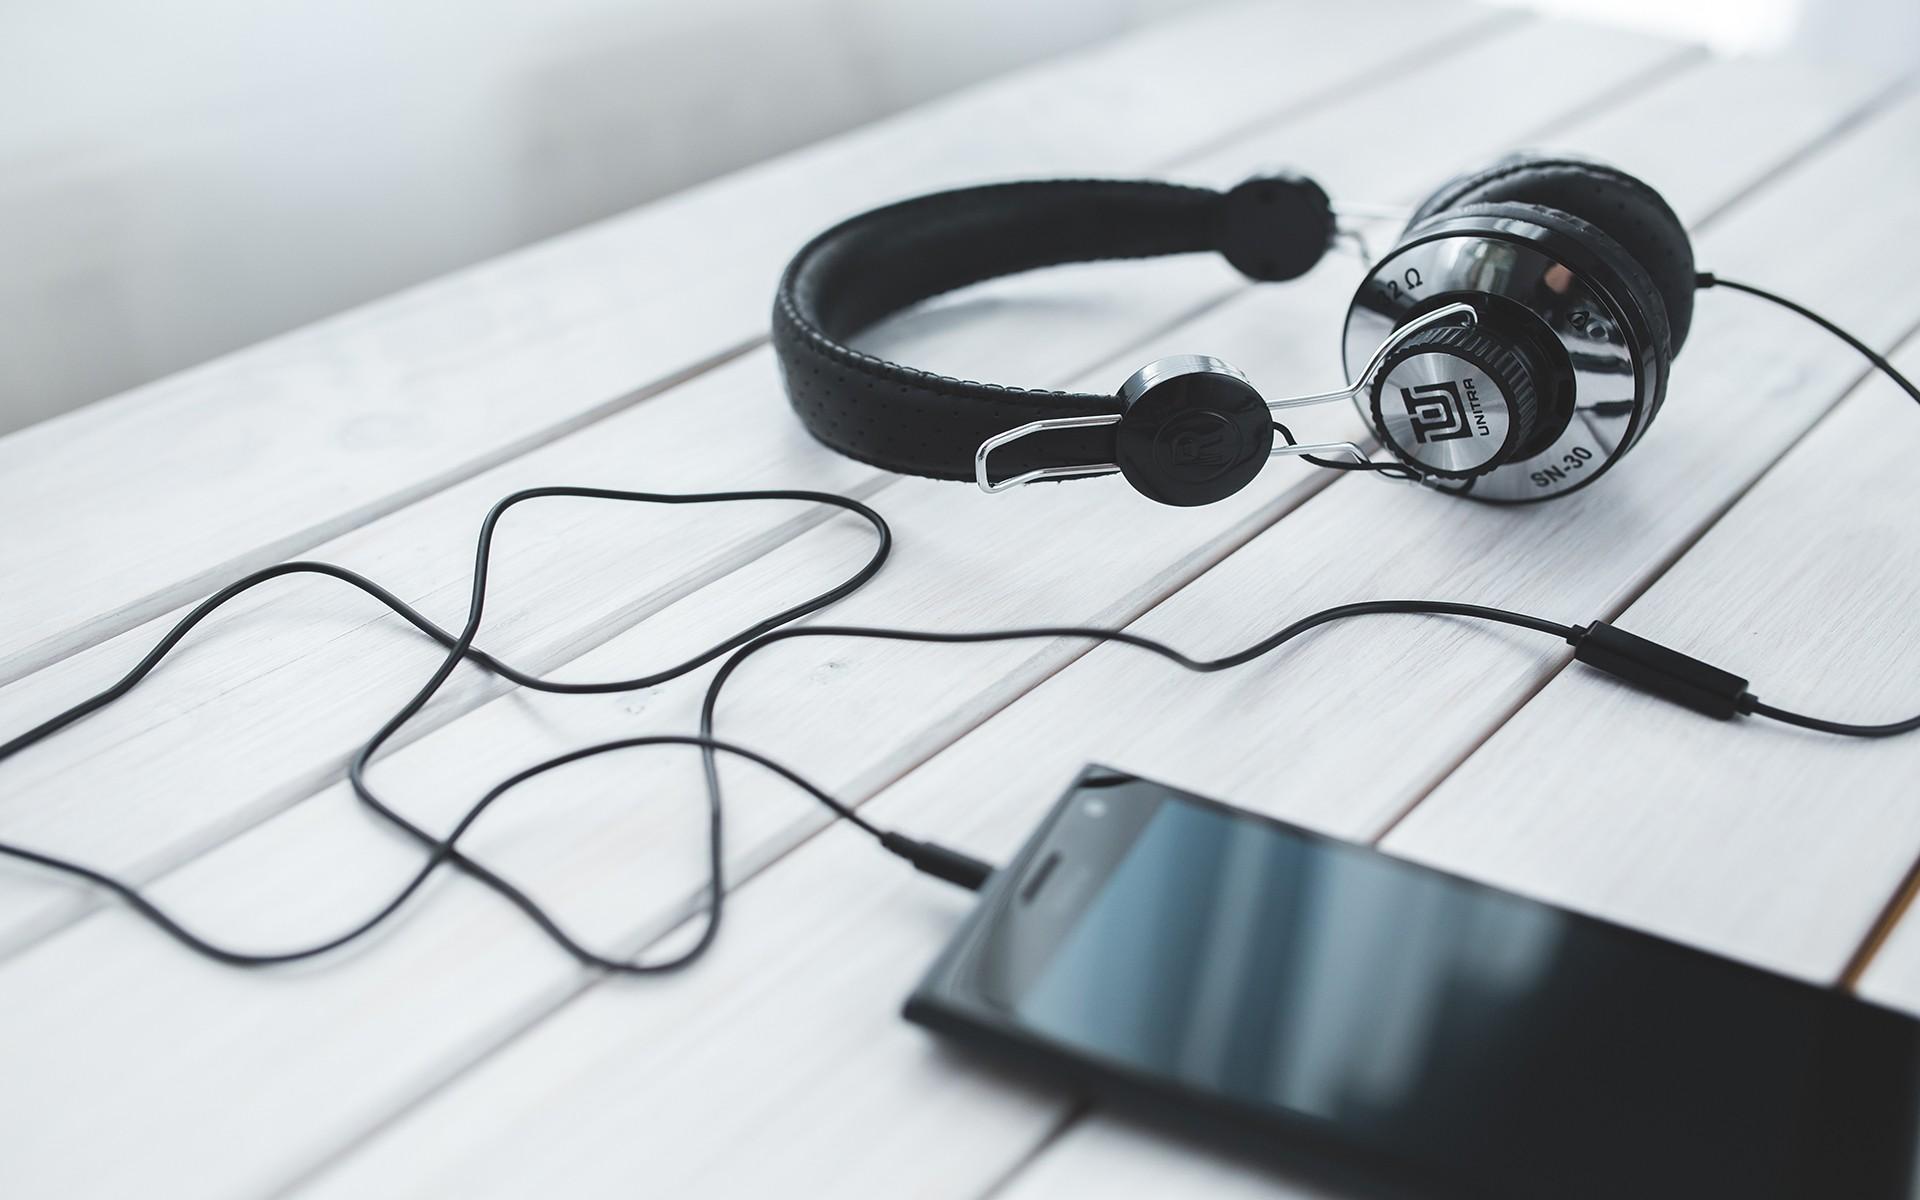 White Gl Es Music Headphones Technology Audio Smartphonend Entertainment Gadget Font Audio Equipment Electronic Device